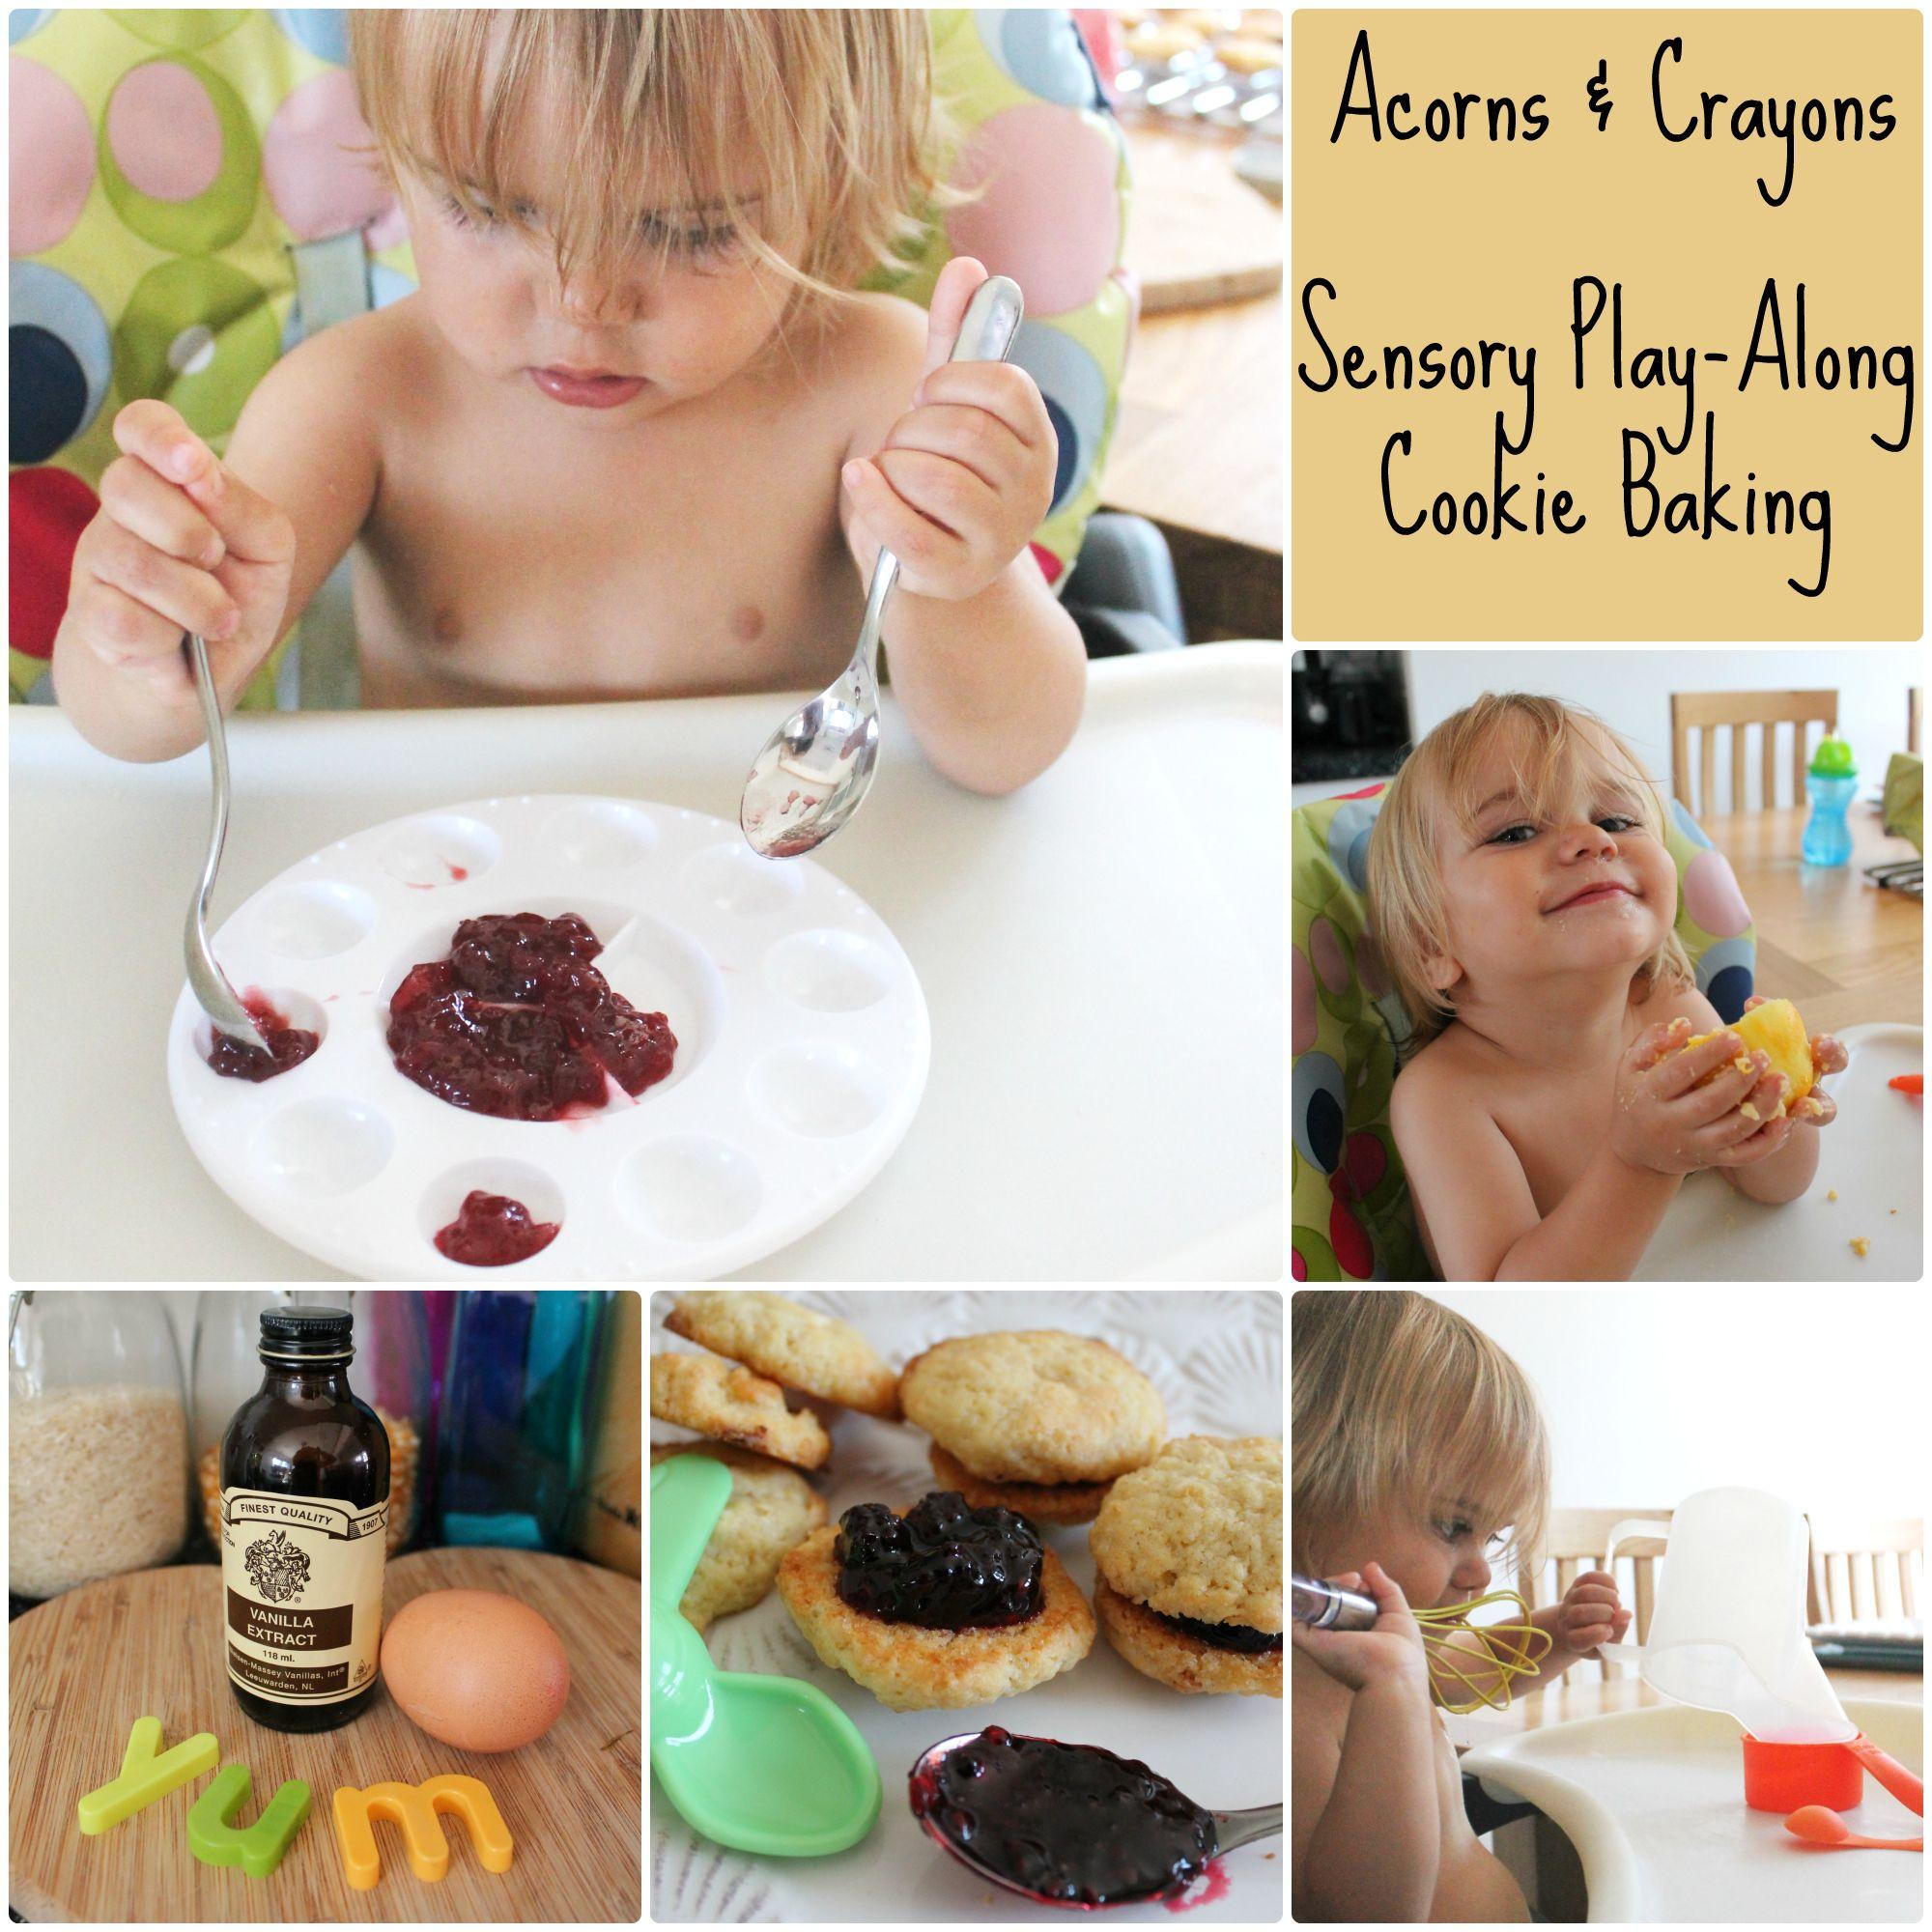 Sensory Play Along Cookie Baking